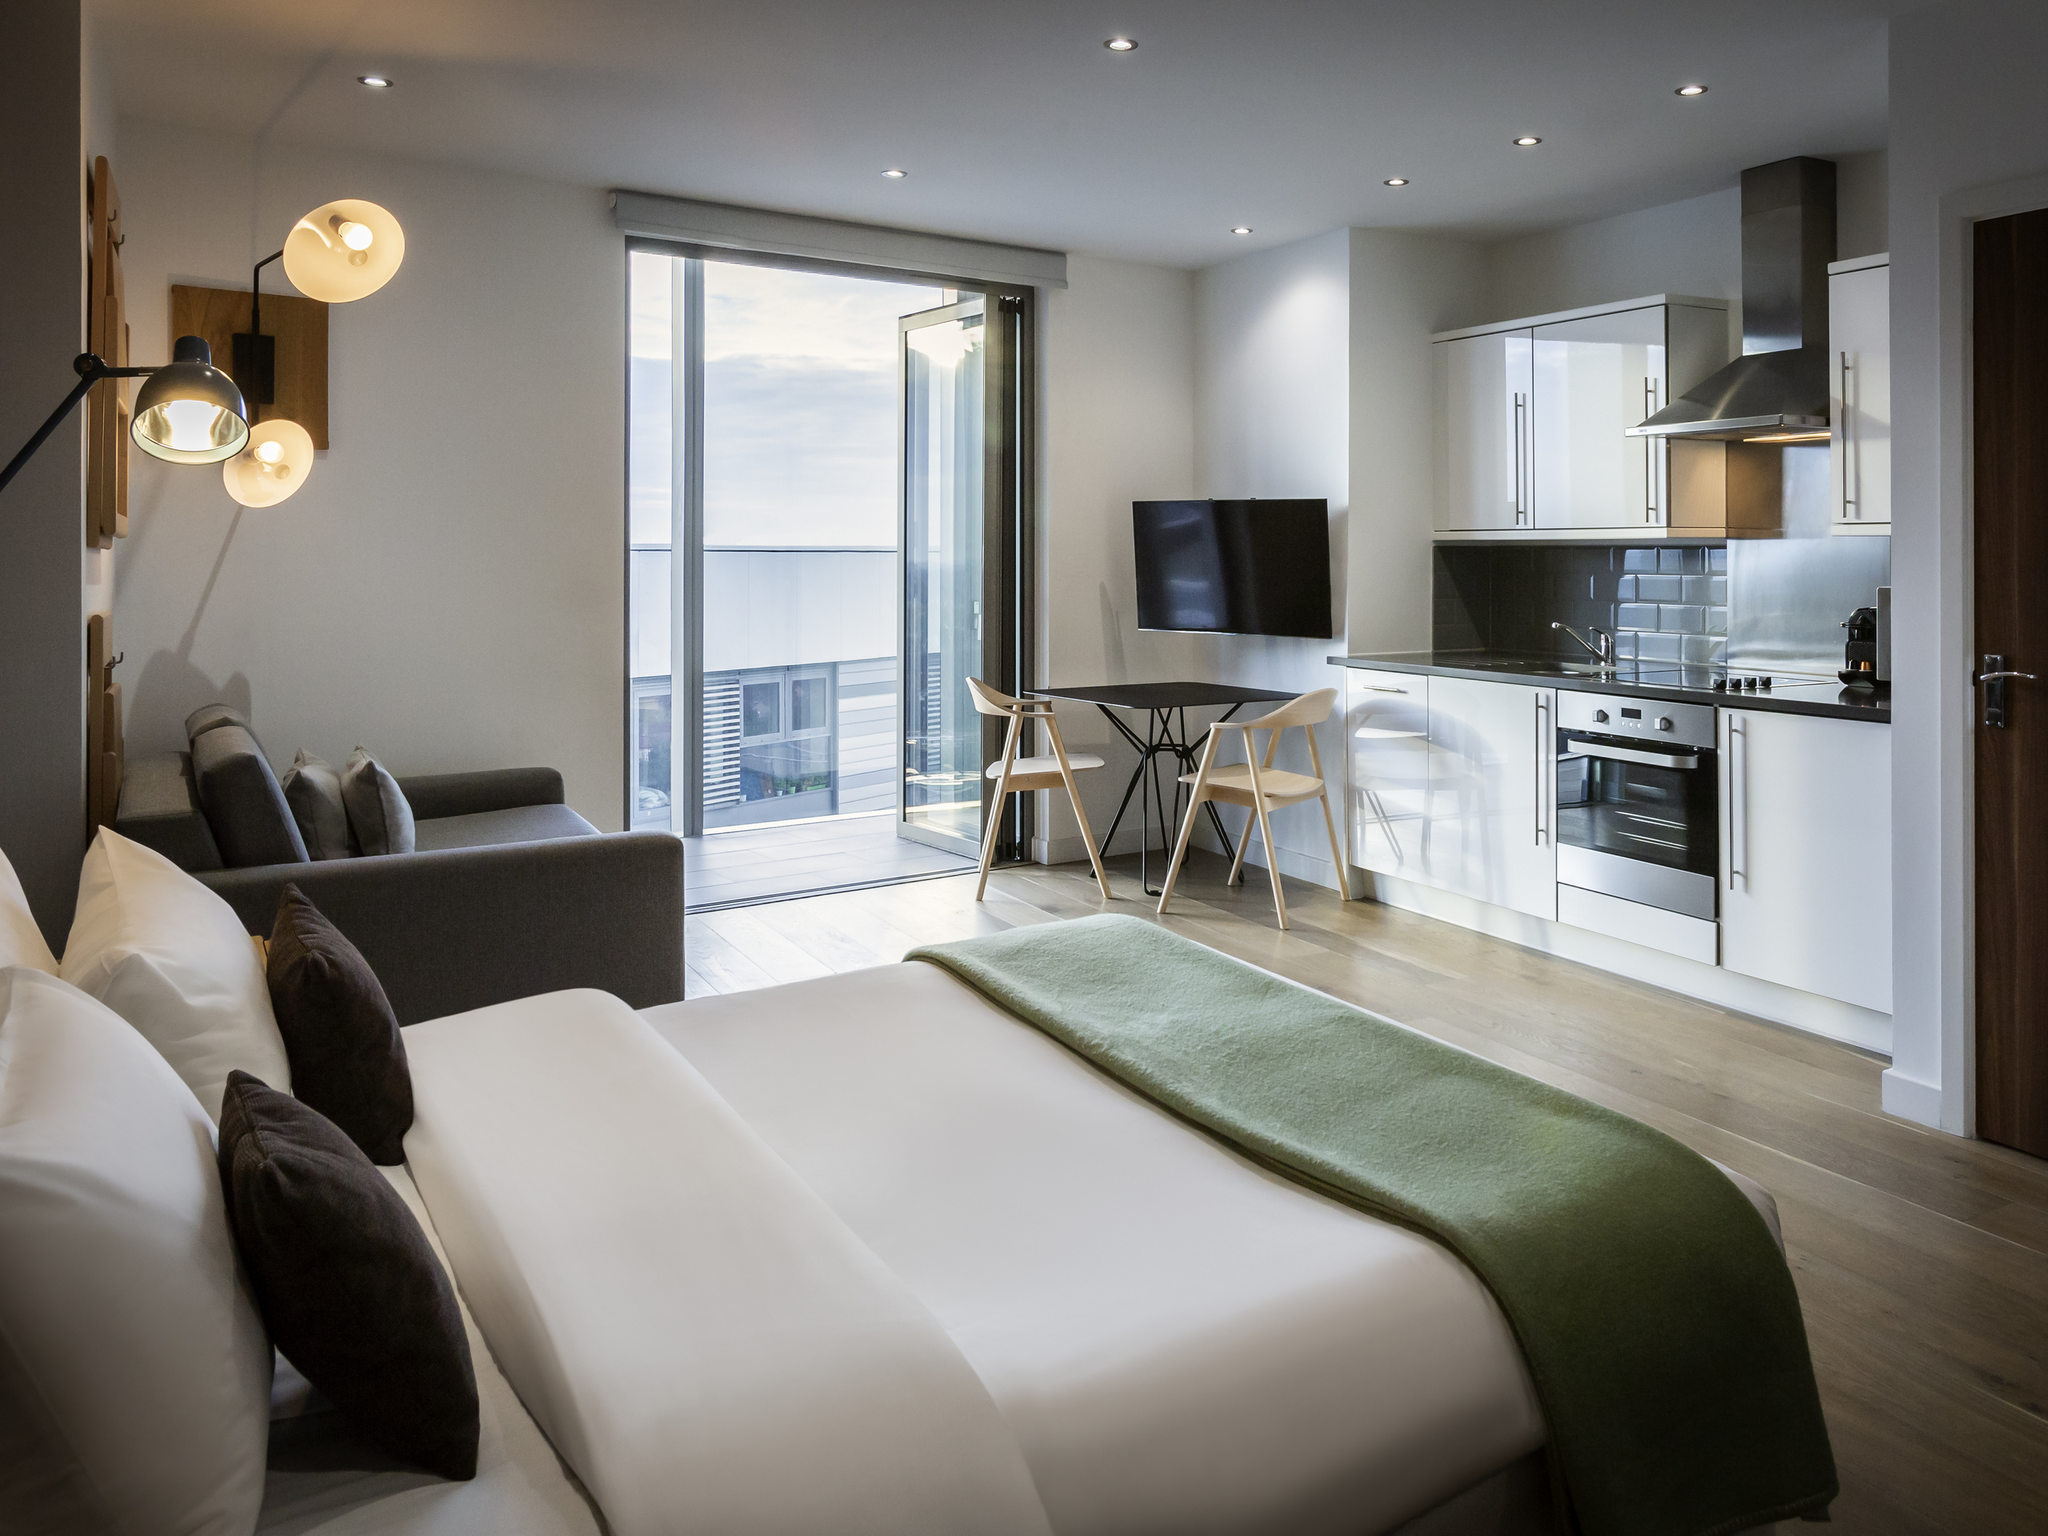 Hotel – Aparthotel Adagio London Brentford (opening oktober 2018)